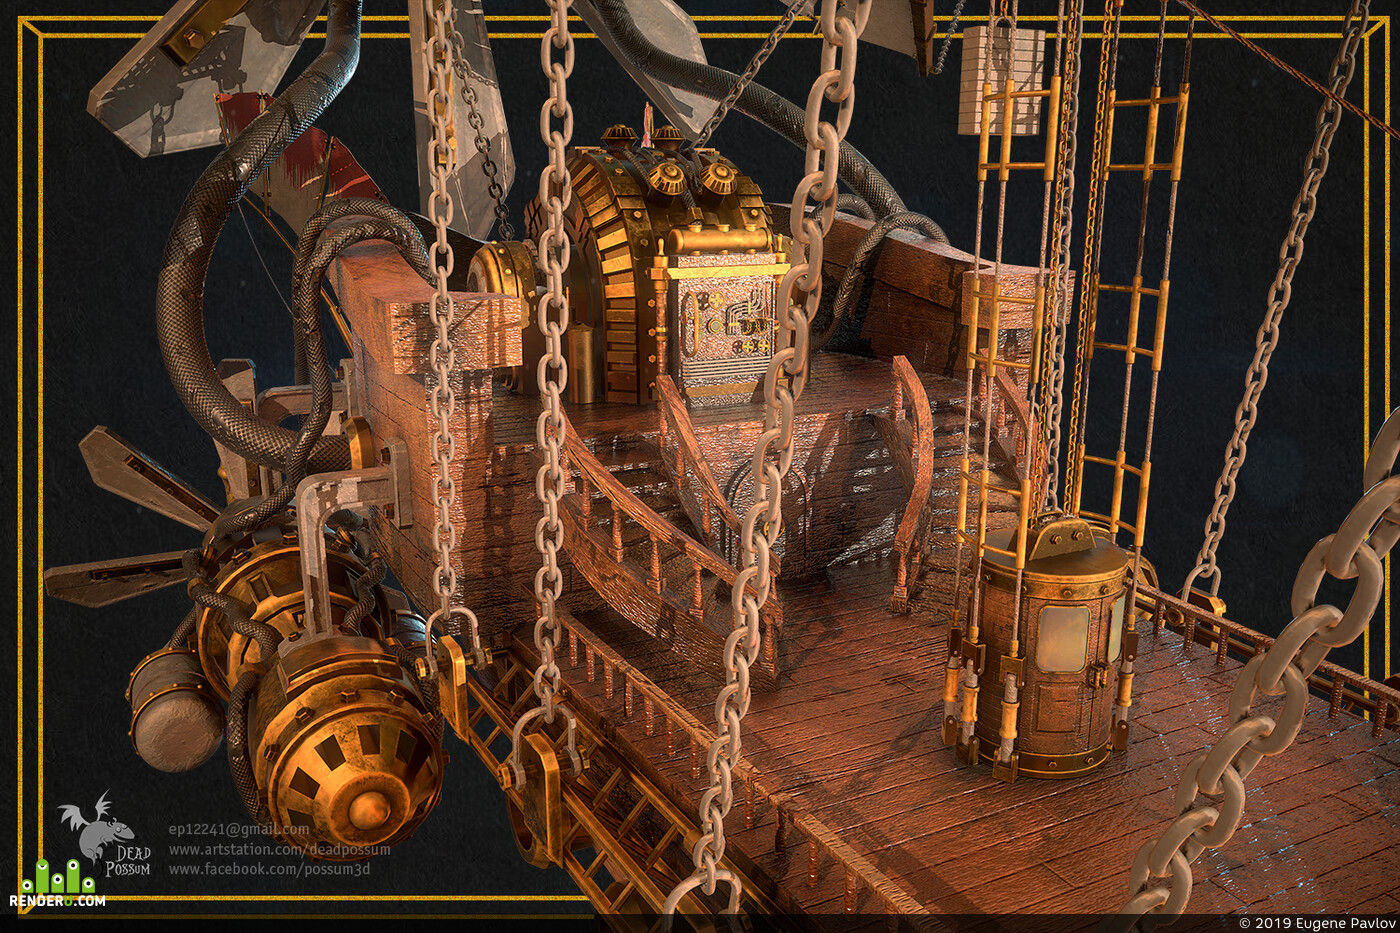 steampunk, blimp, antiaircraft